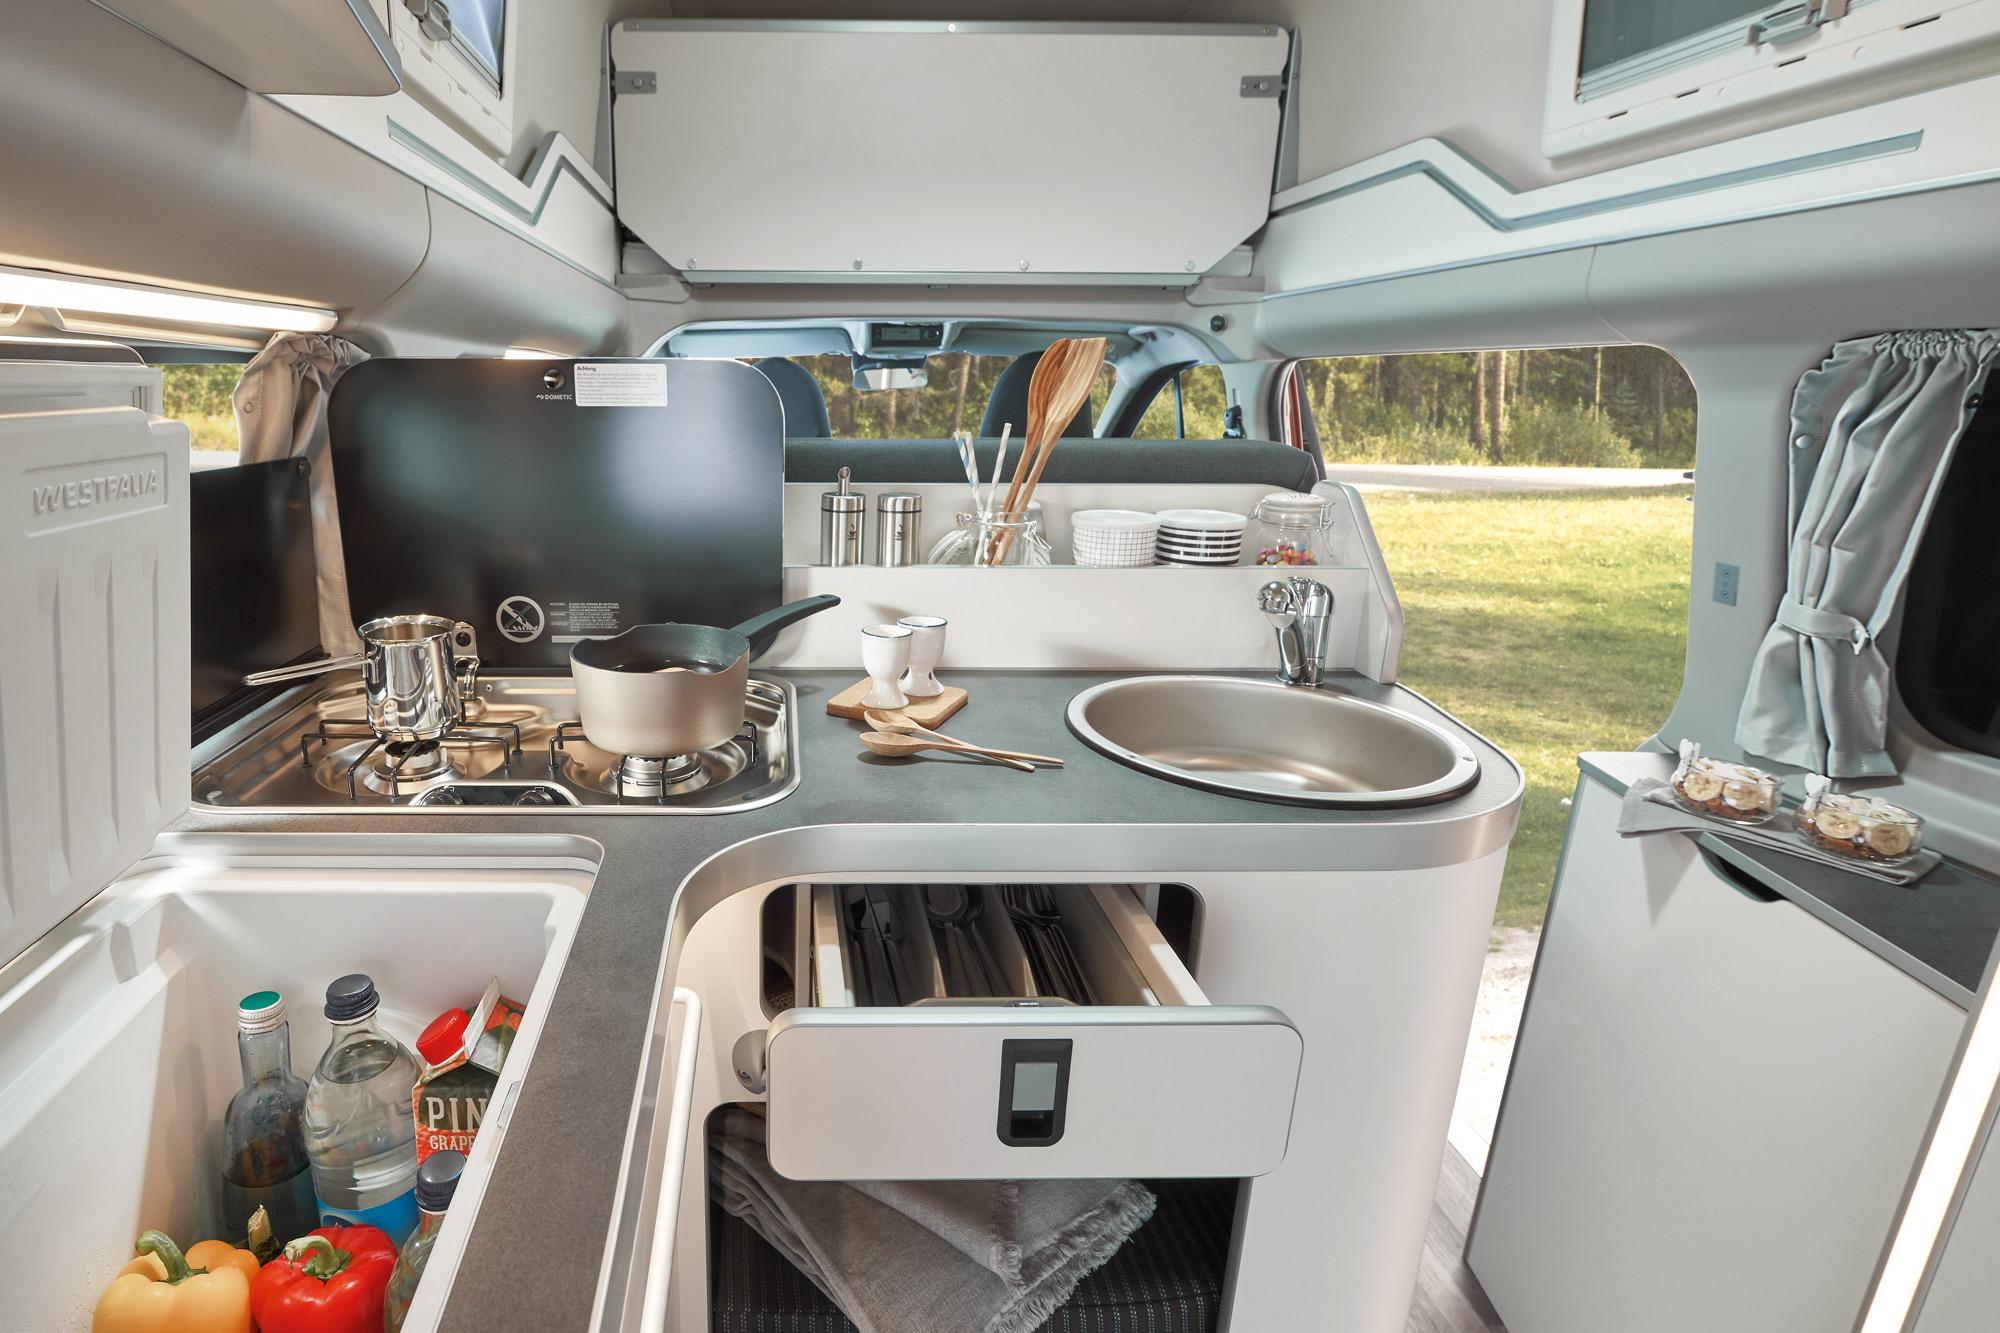 Keuken Westfalia Ford Nugget Hoogdak